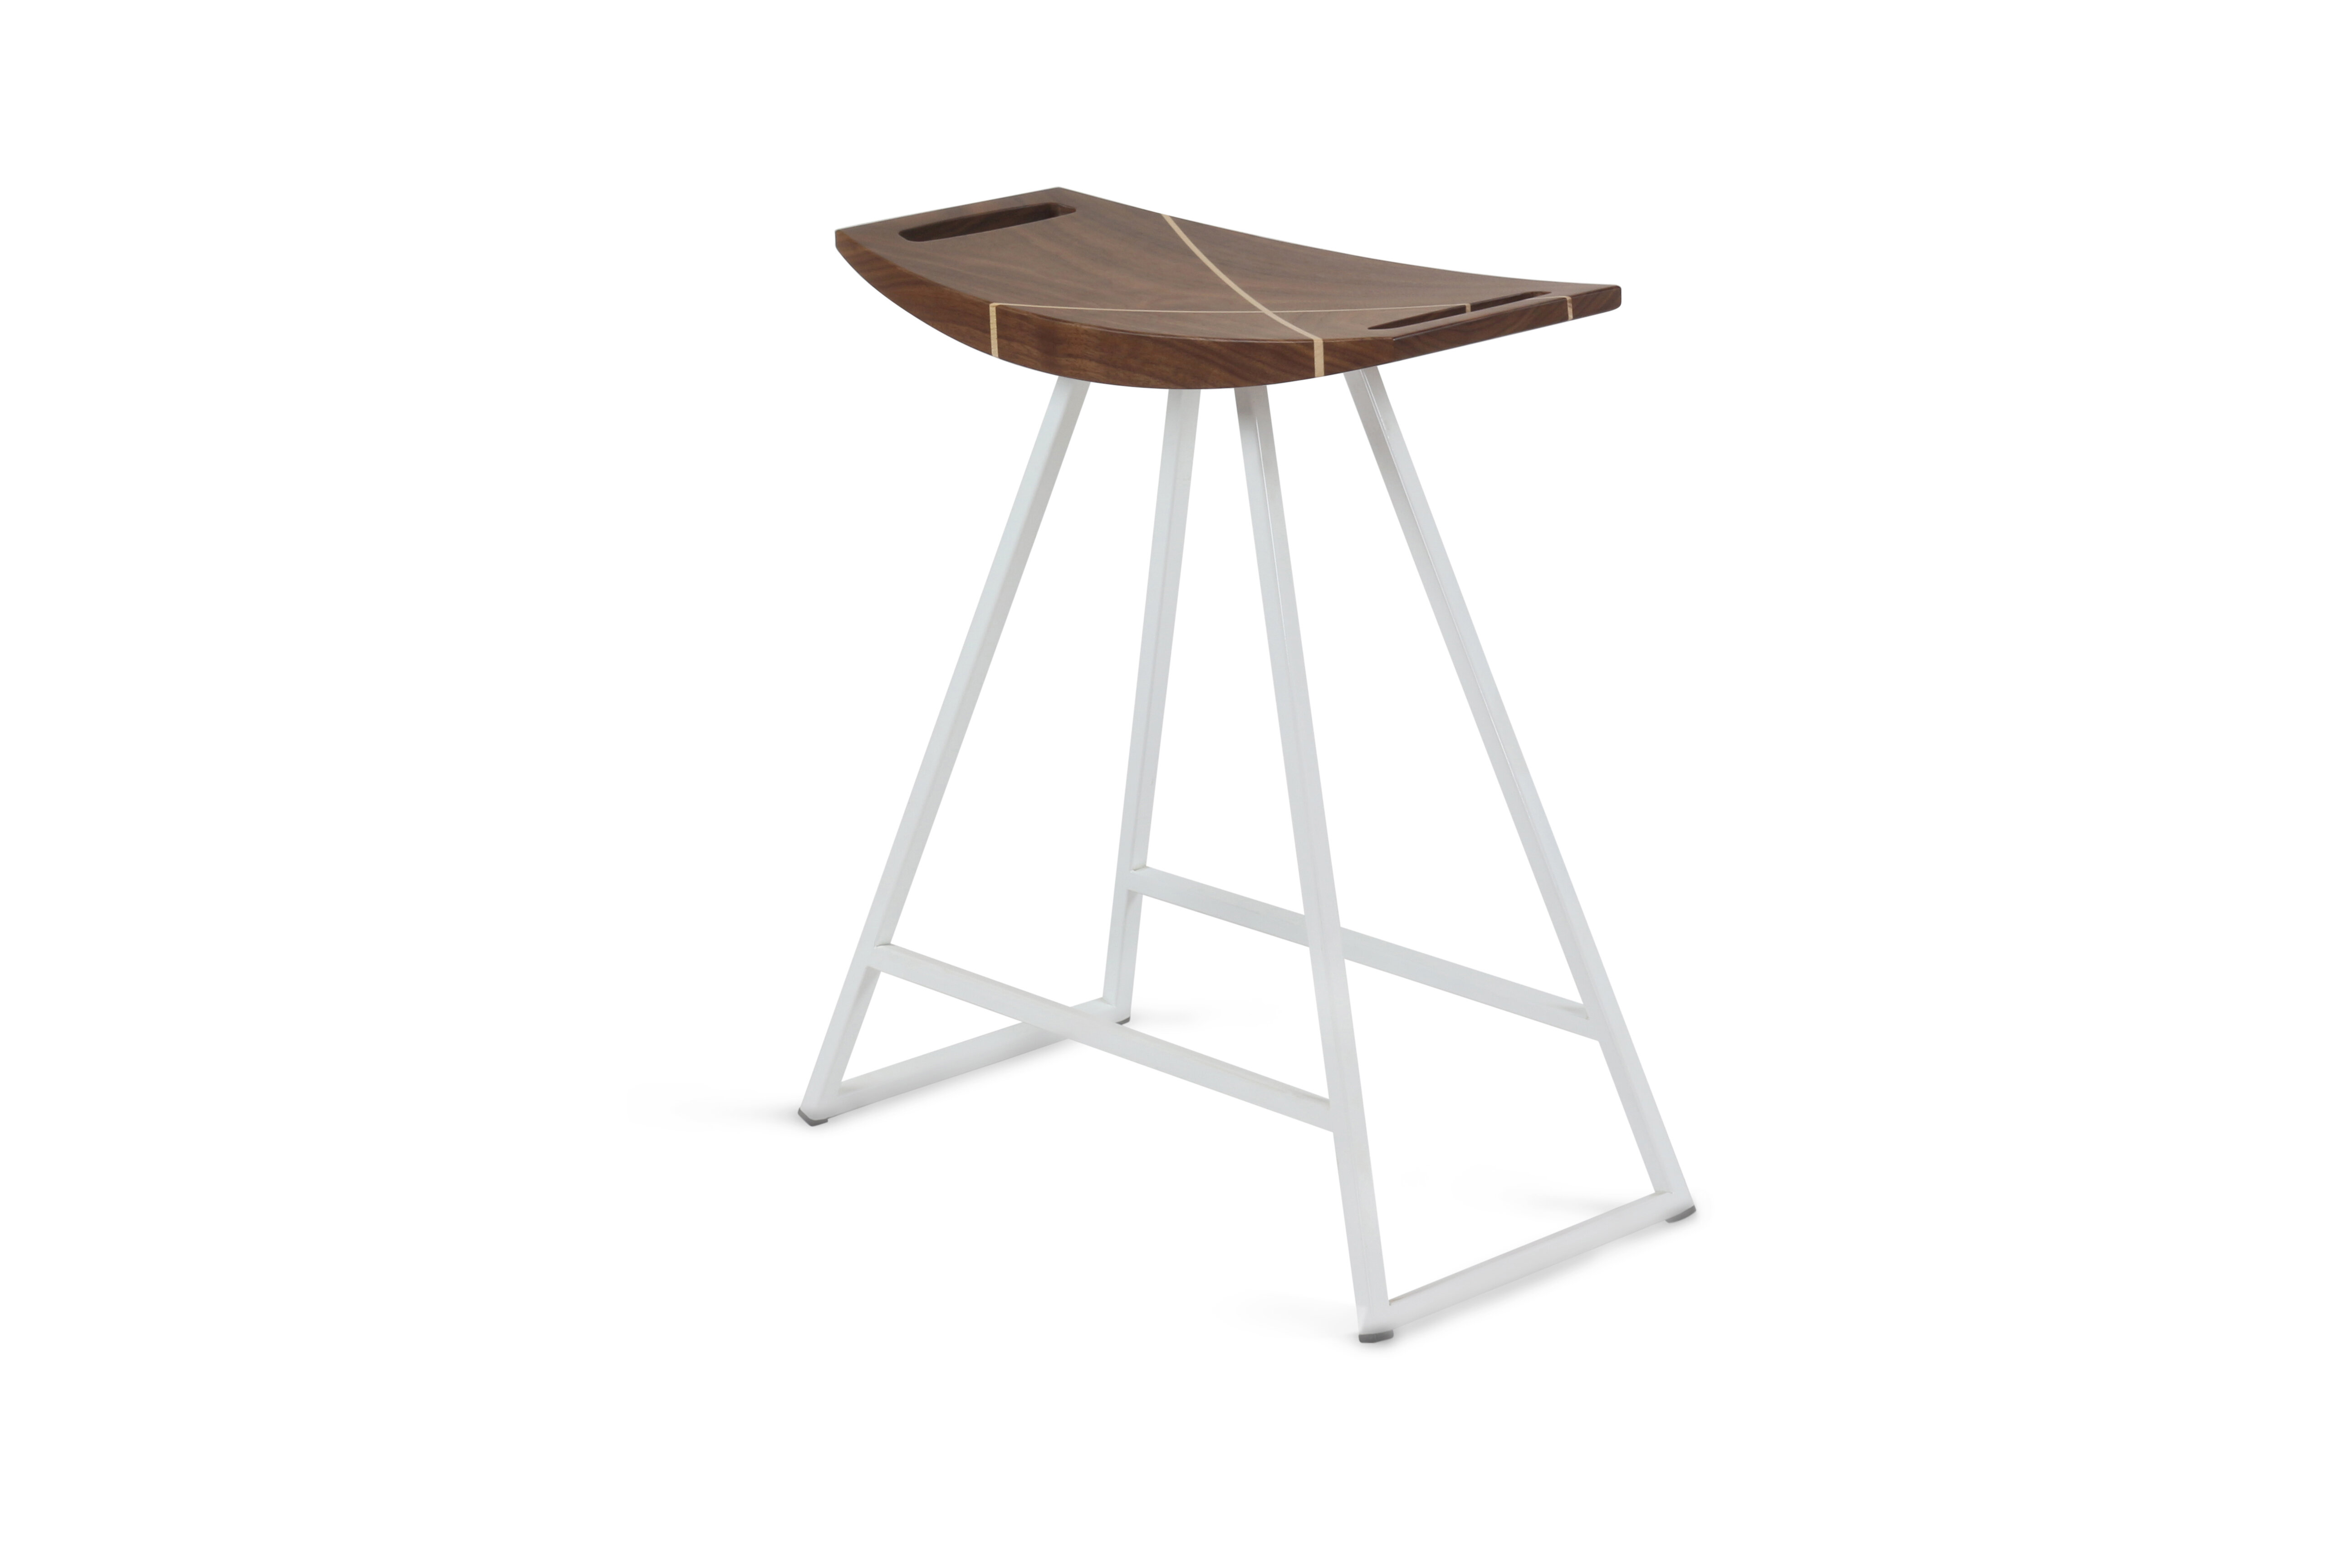 Tronk Design Roberts Solid Wood Accent Stool Perigold